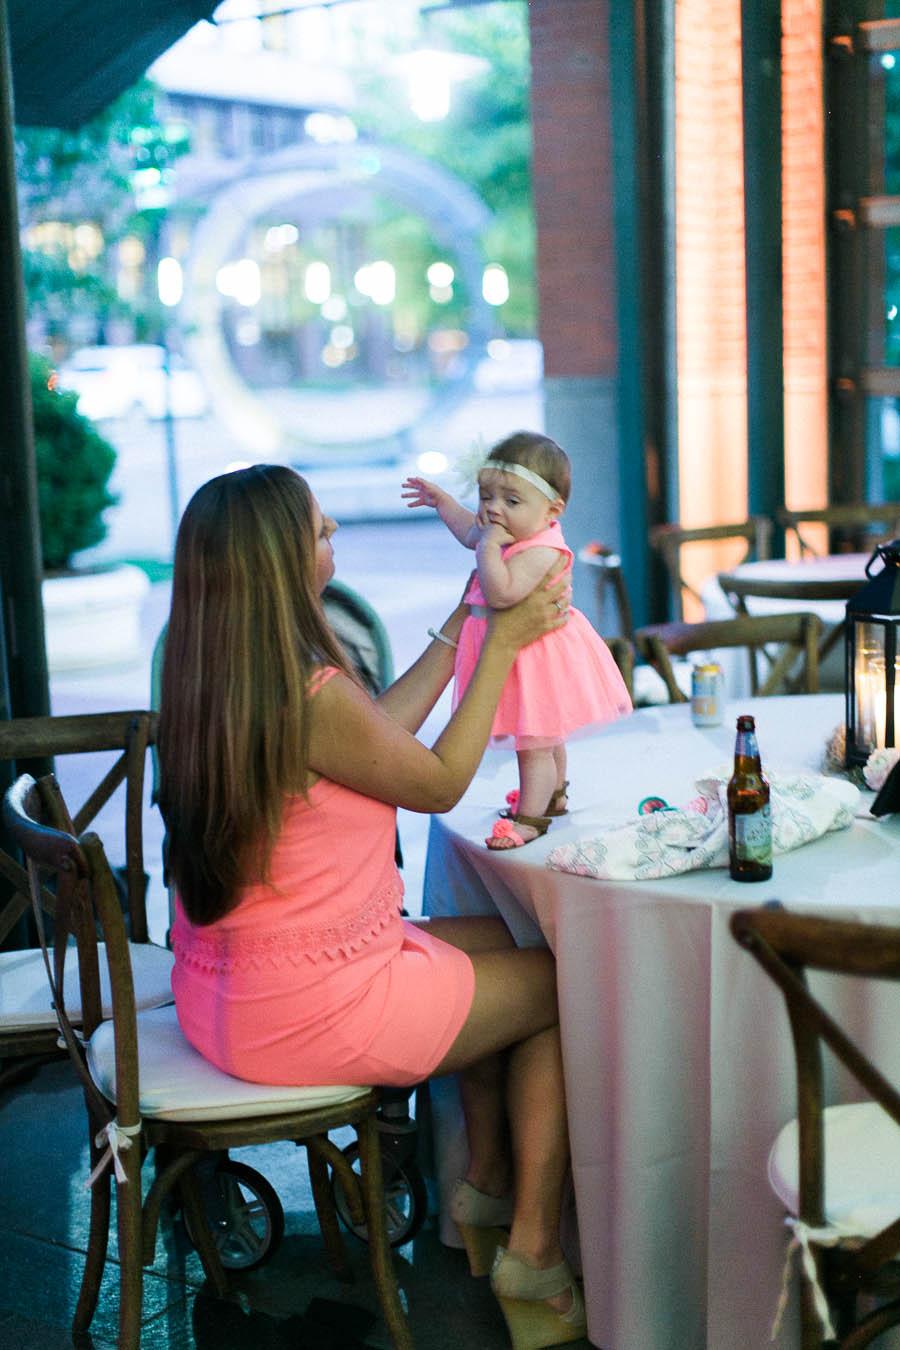 chattanooga film wedding photographer documentary natural gentle real life ©2016abigailbobophotography-72.jpg